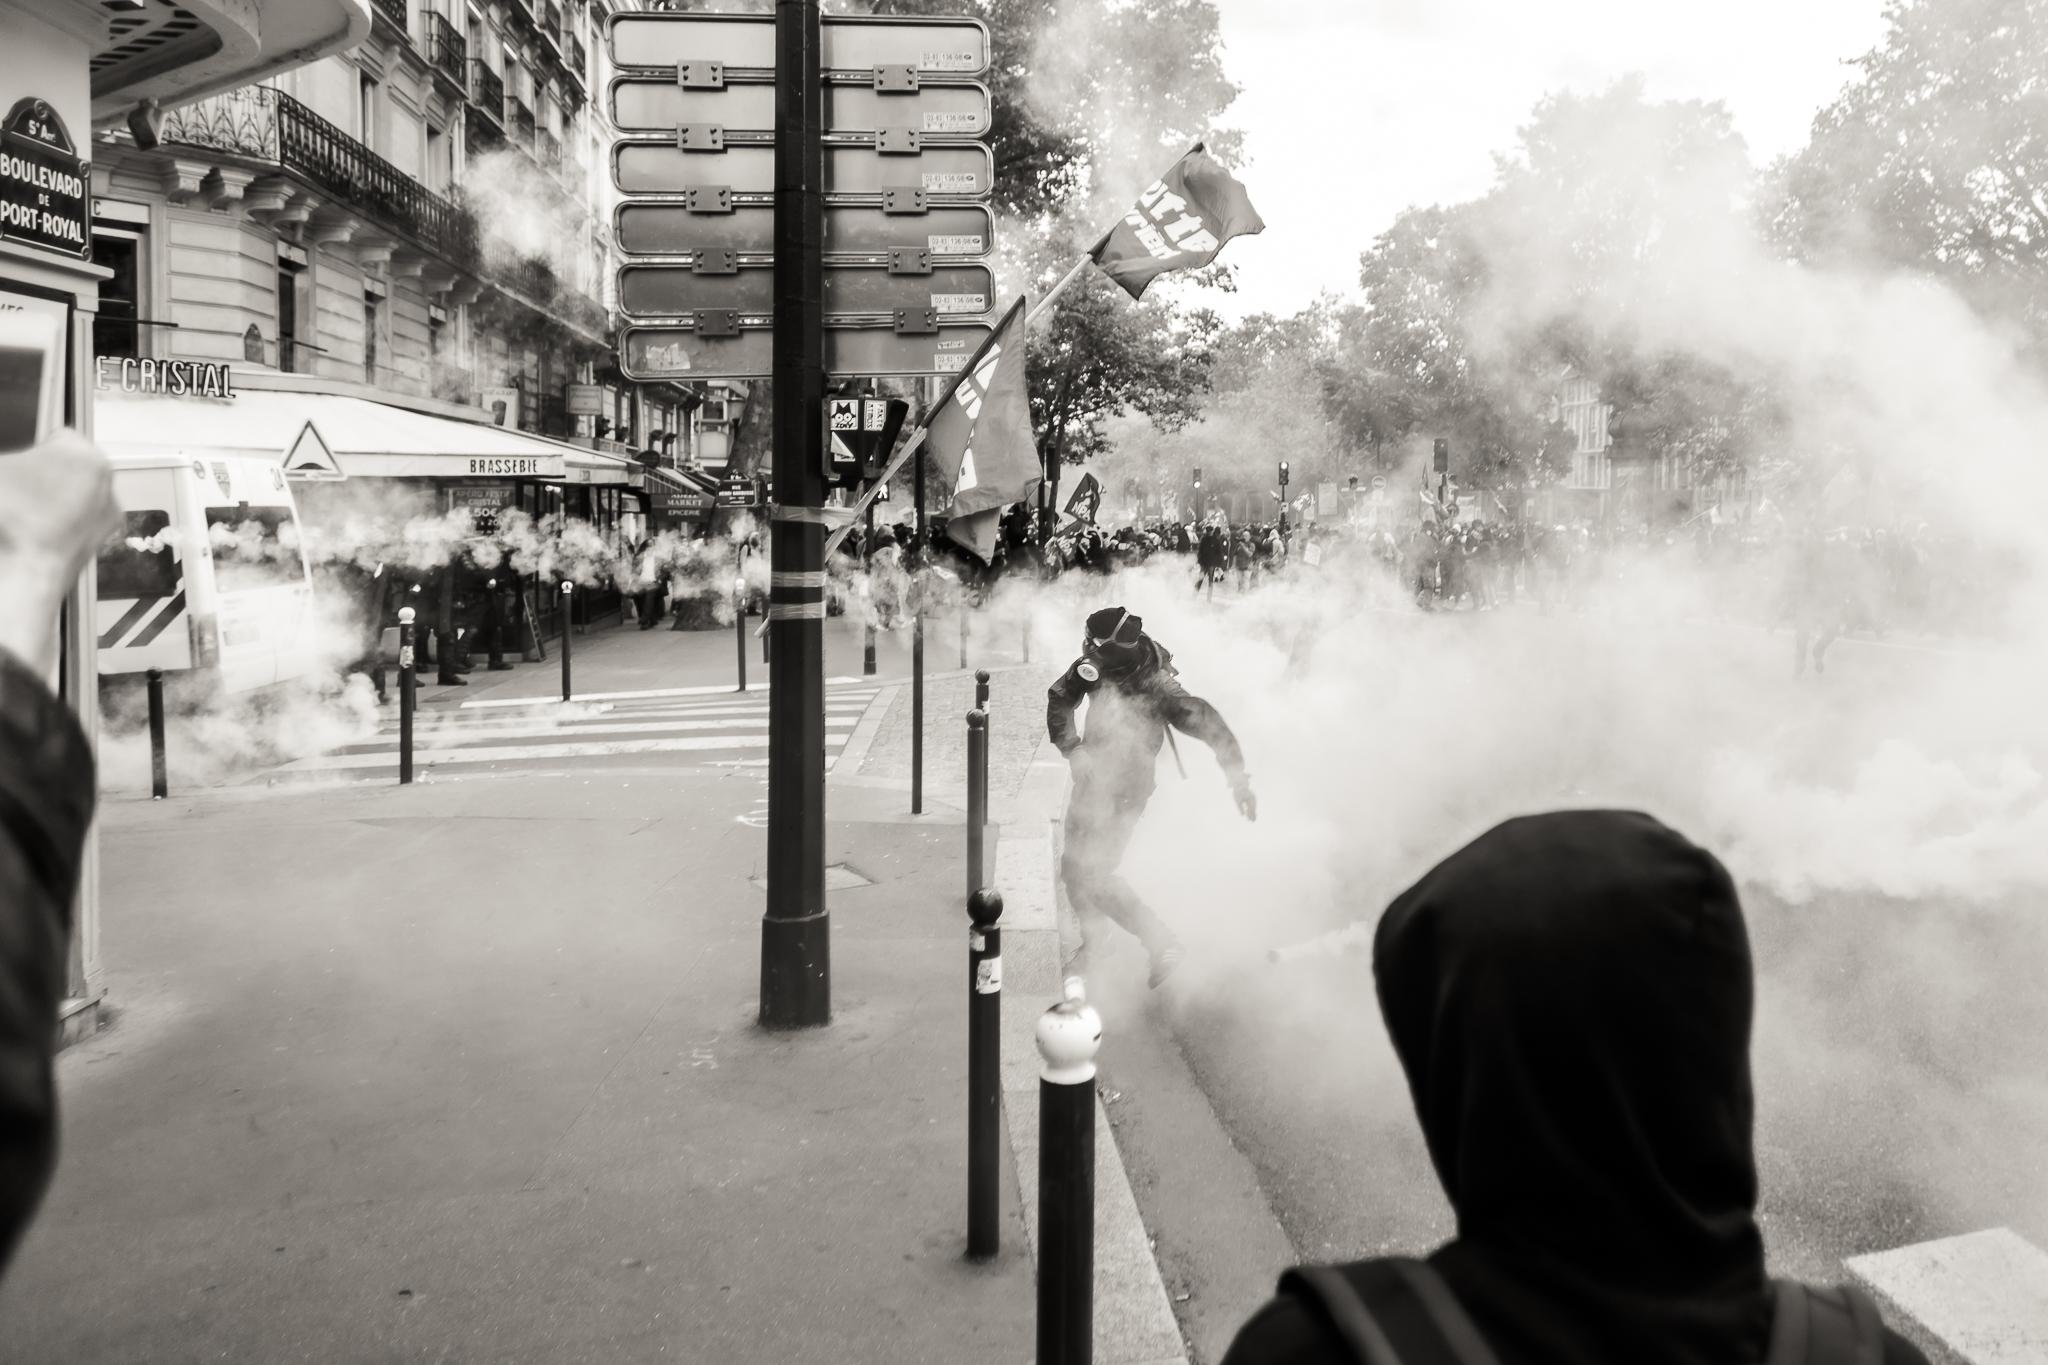 MO_Paris_Manif-43